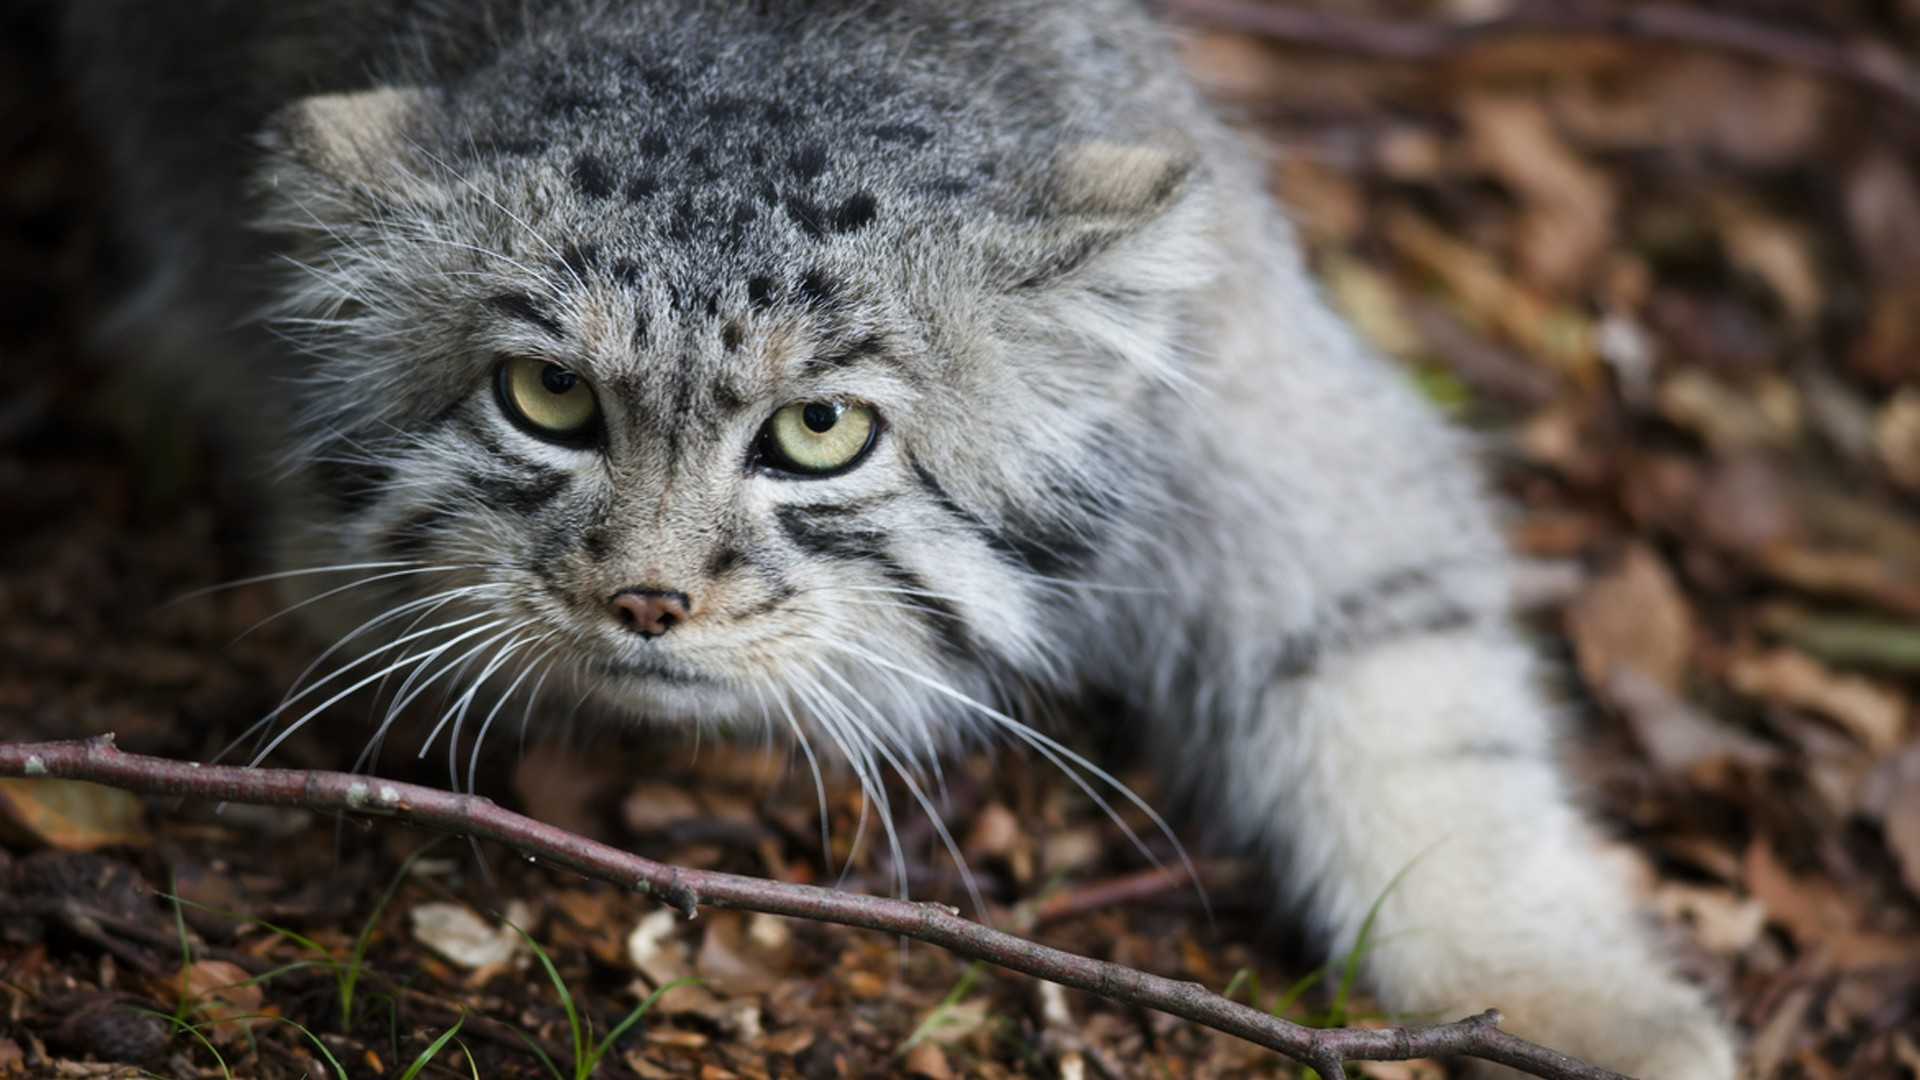 General 1920x1080 wild cat animals mammals Pallas's Cat looking at viewer big cats animal eyes